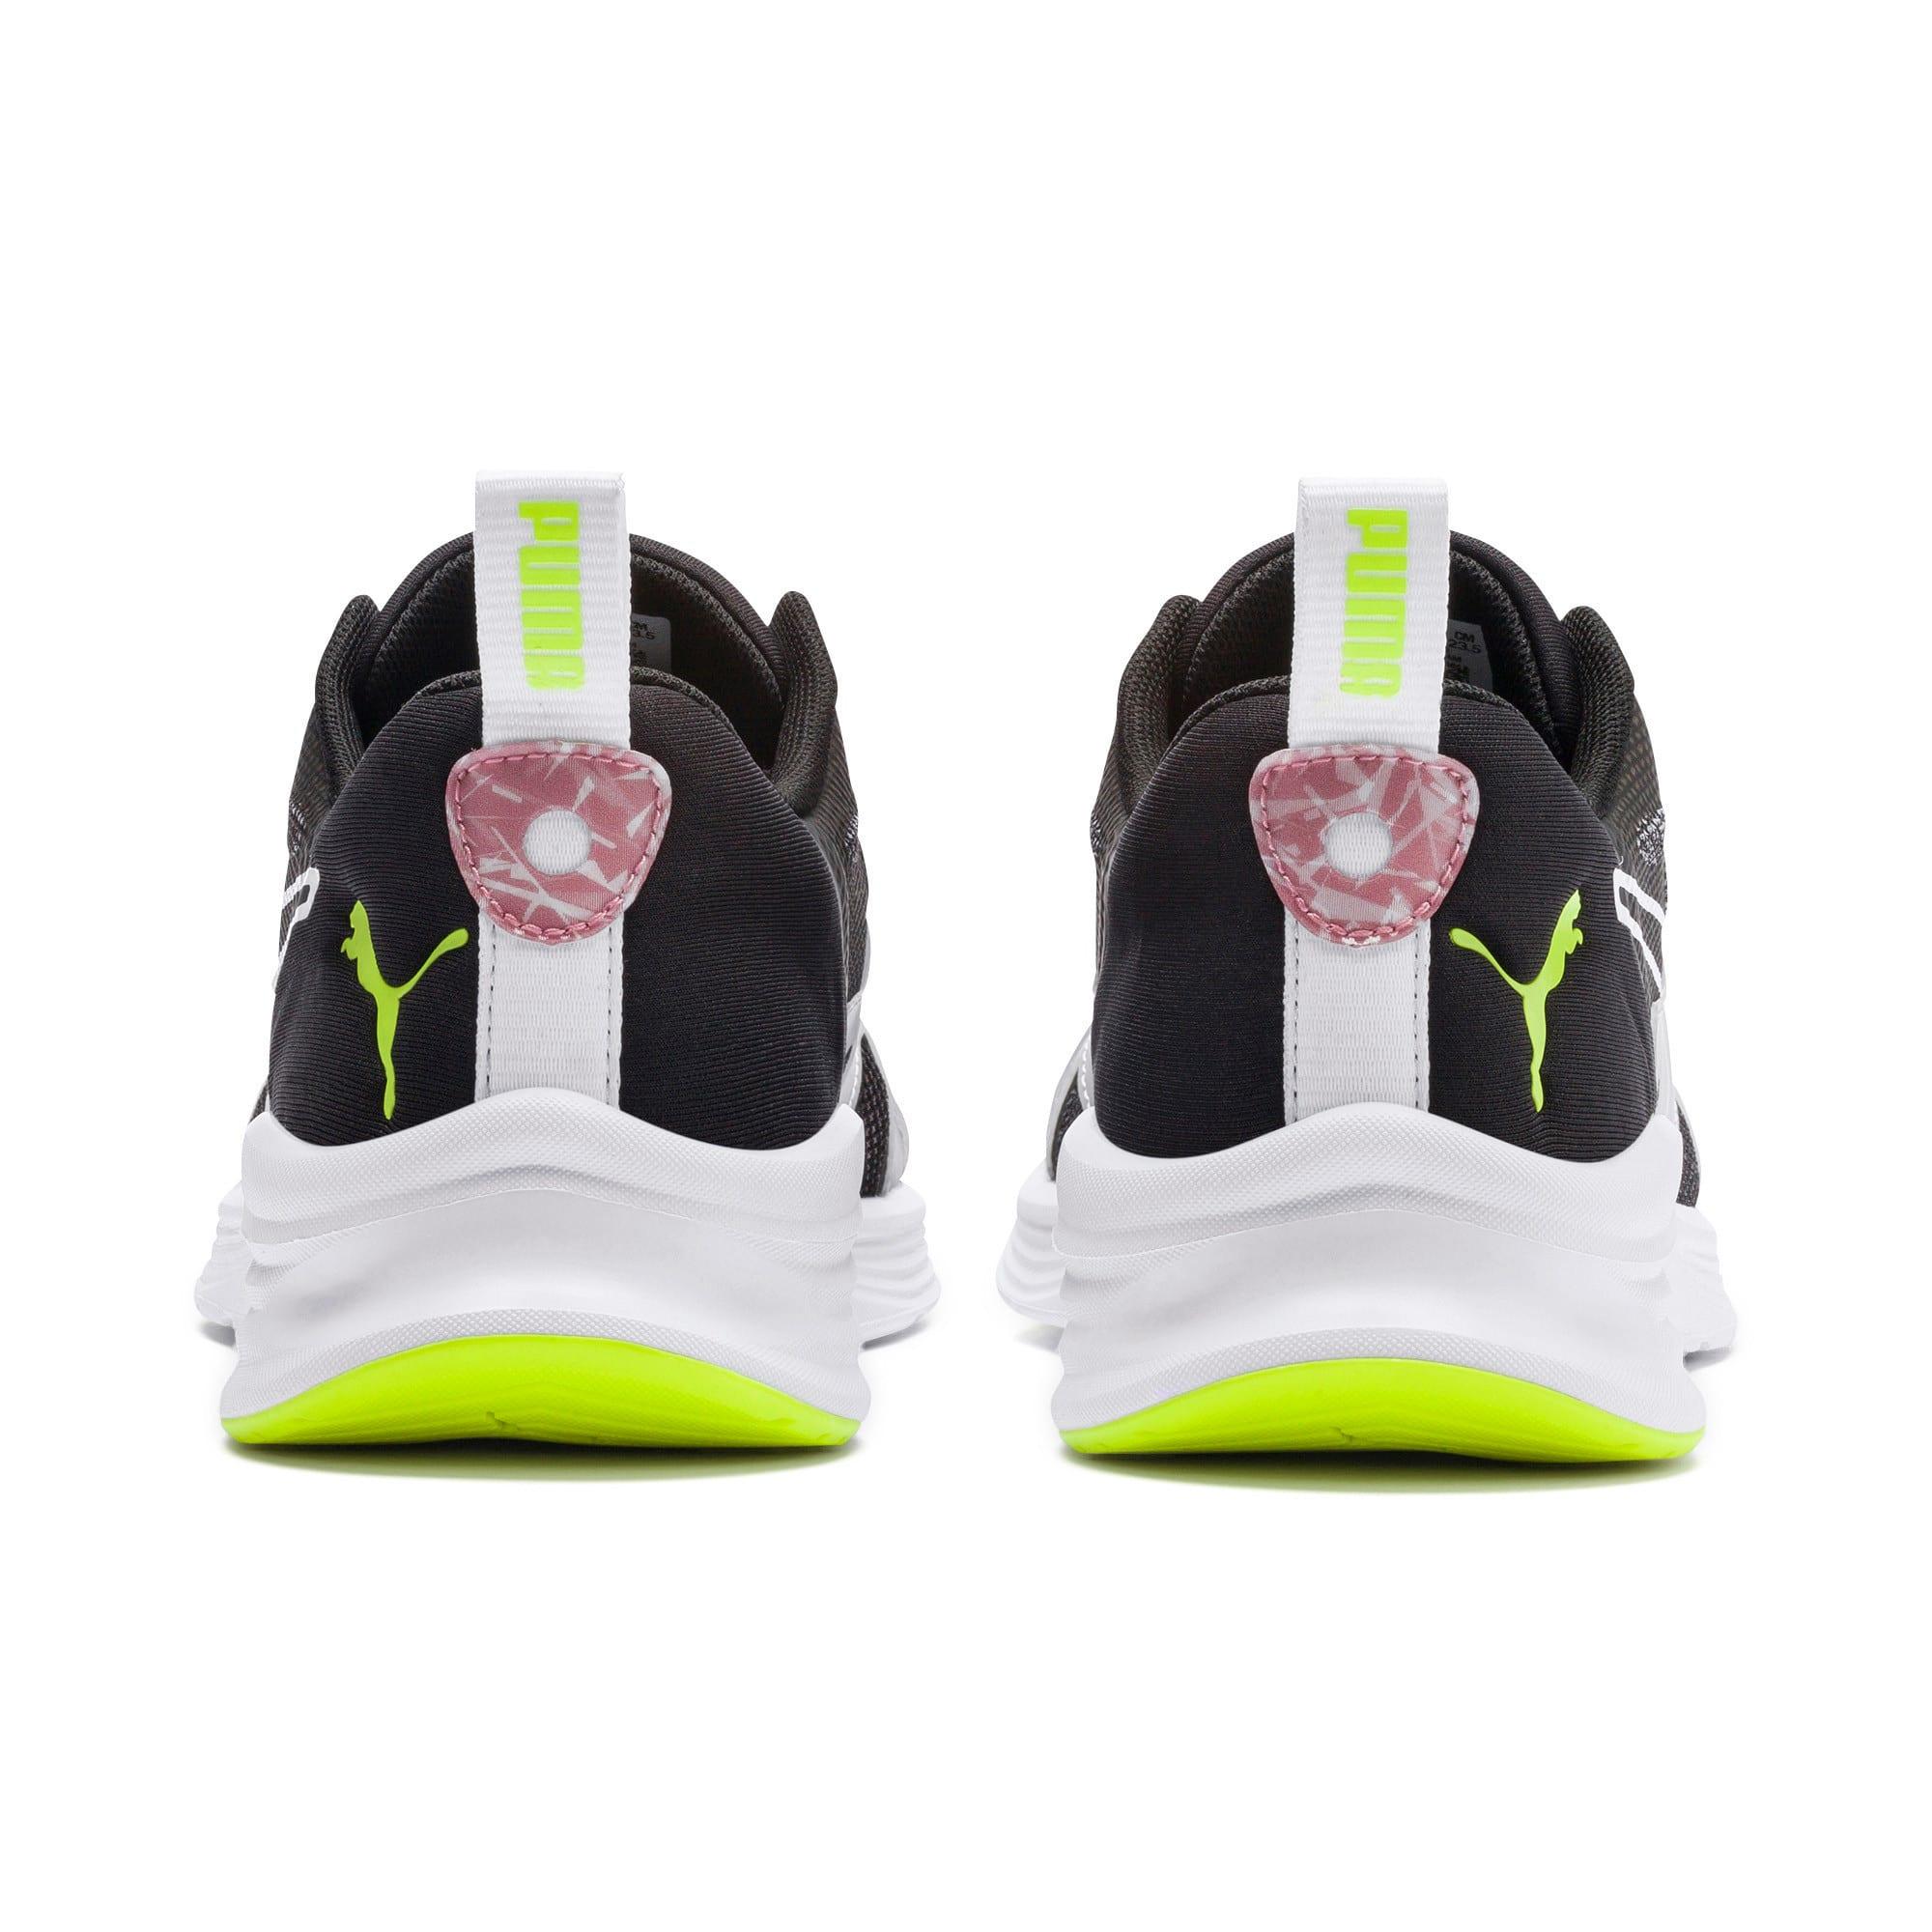 Thumbnail 6 of HYBRID Fuego Shift Women's Running Shoes, Puma Black-Bridal Rose, medium-IND